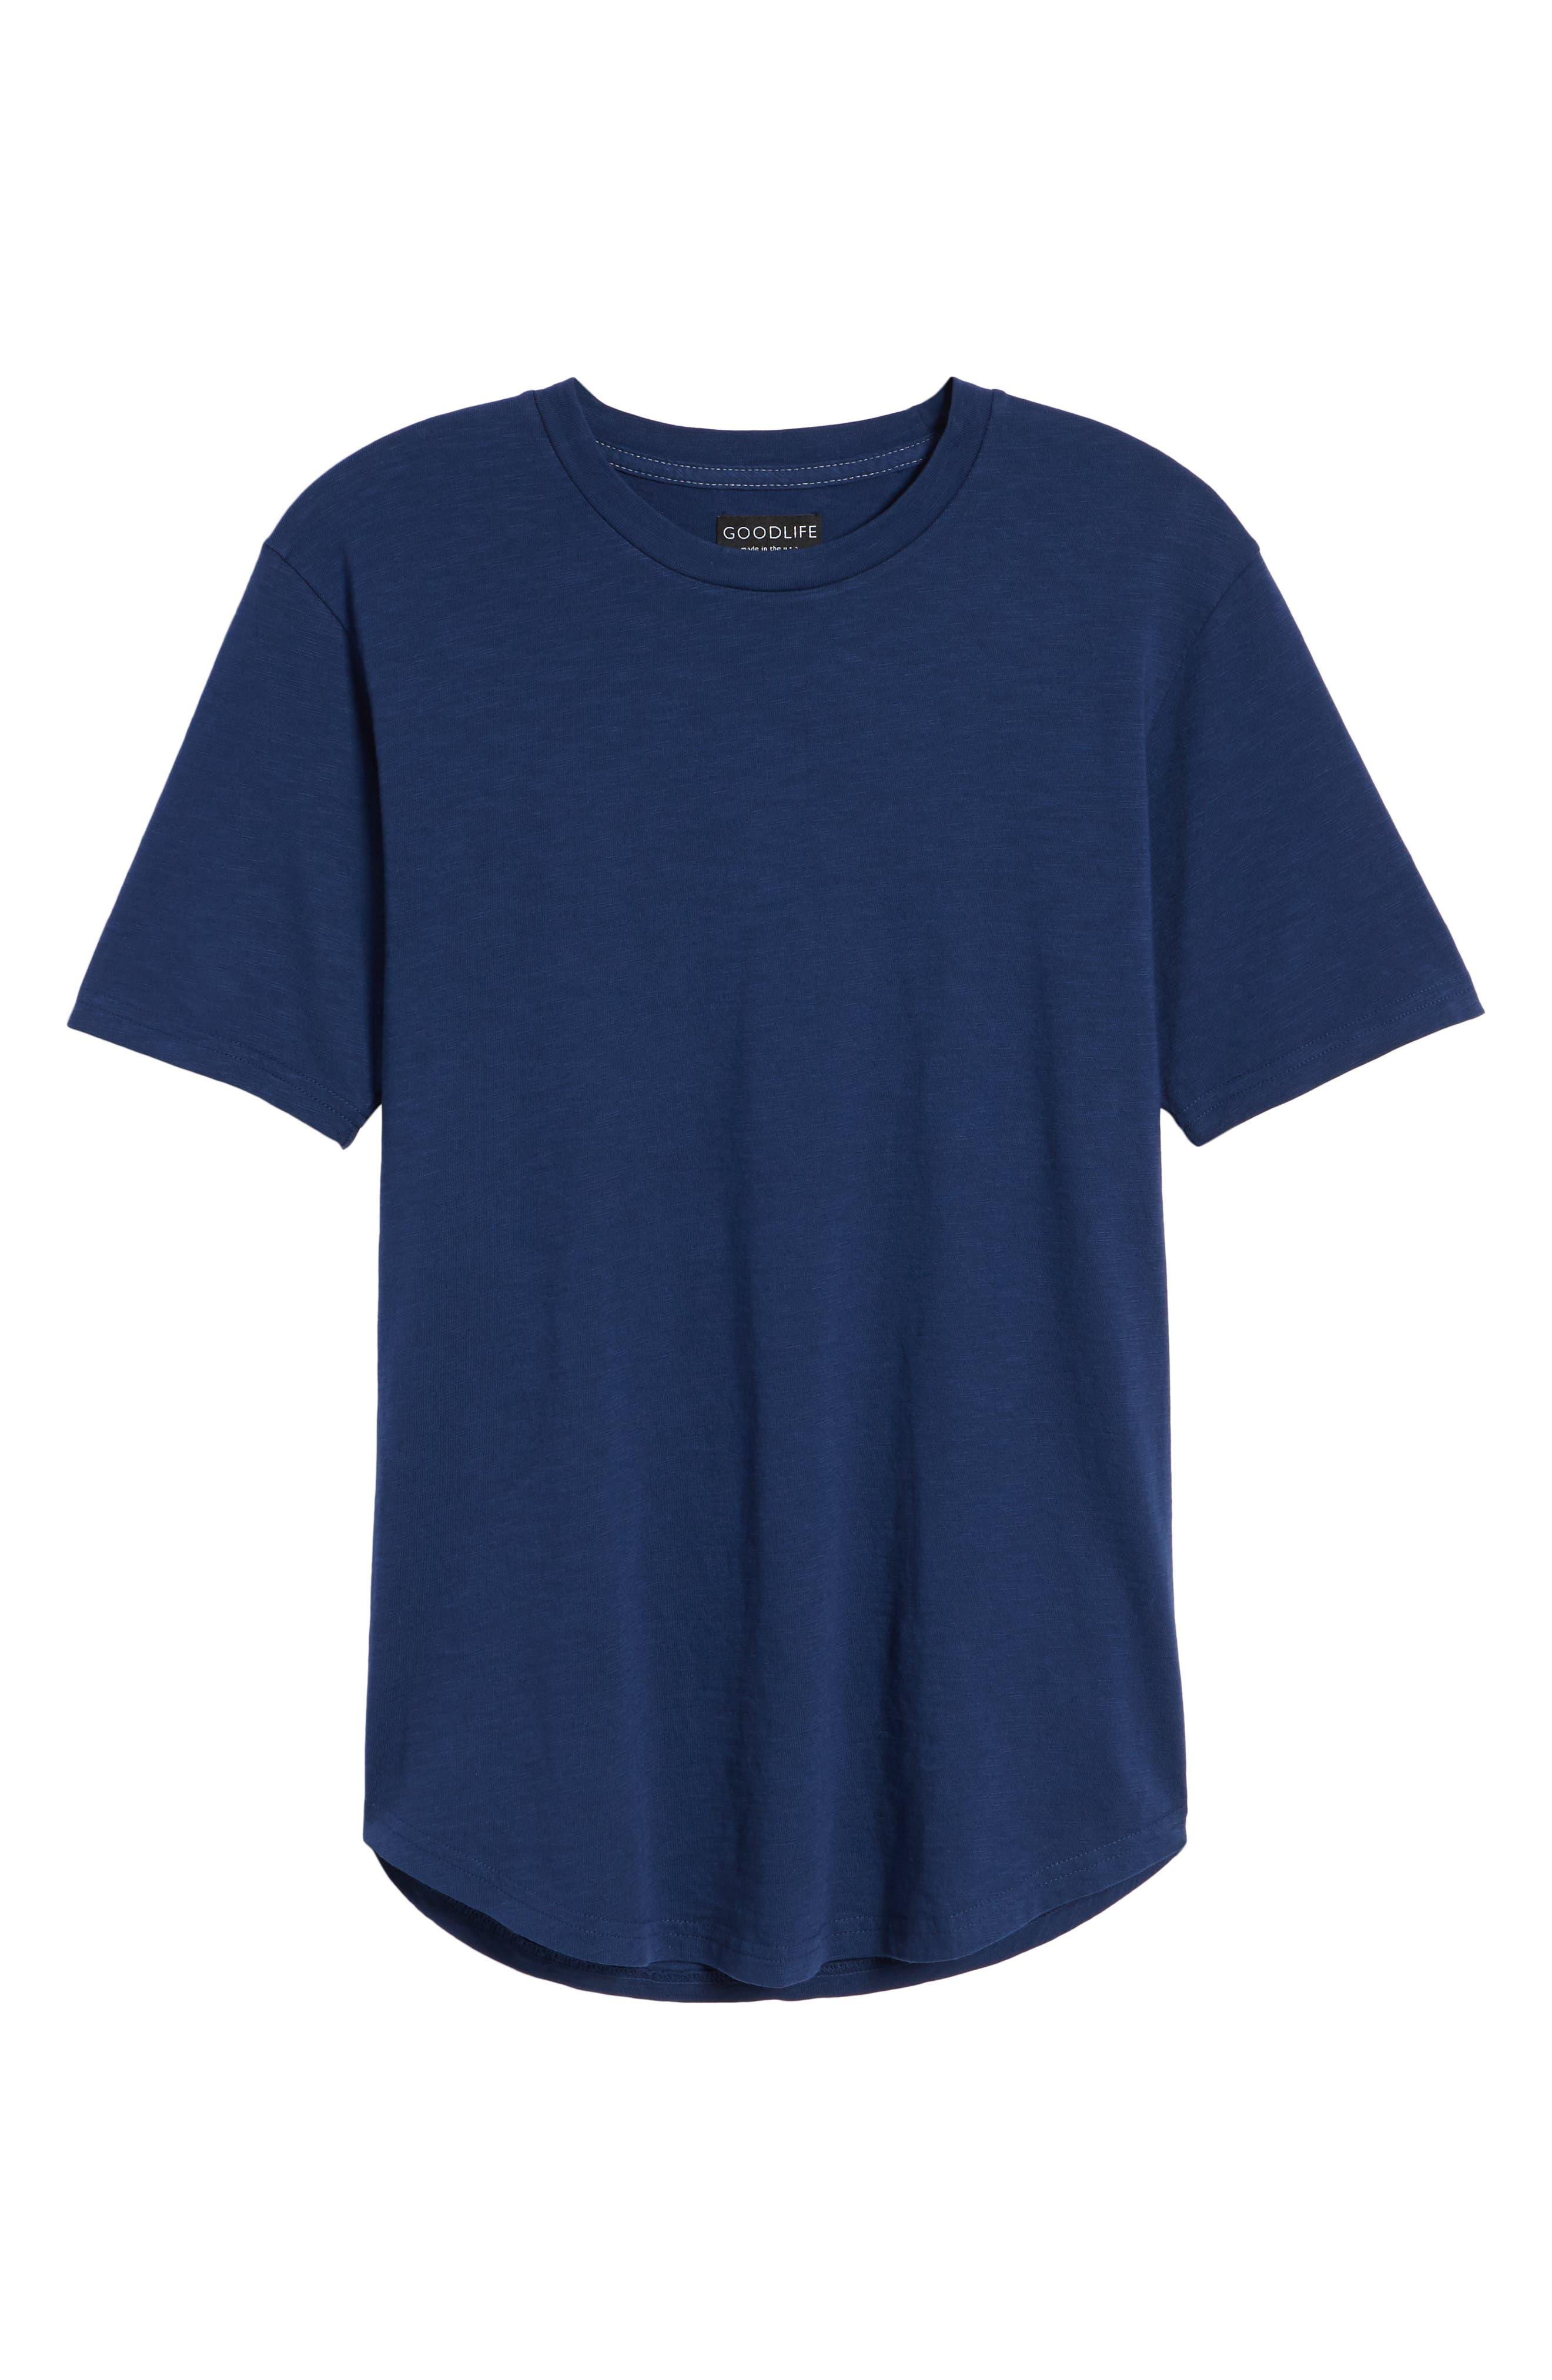 Scallop Hem Slub Crewneck T-Shirt,                             Alternate thumbnail 6, color,                             GOODLIFE NAVY